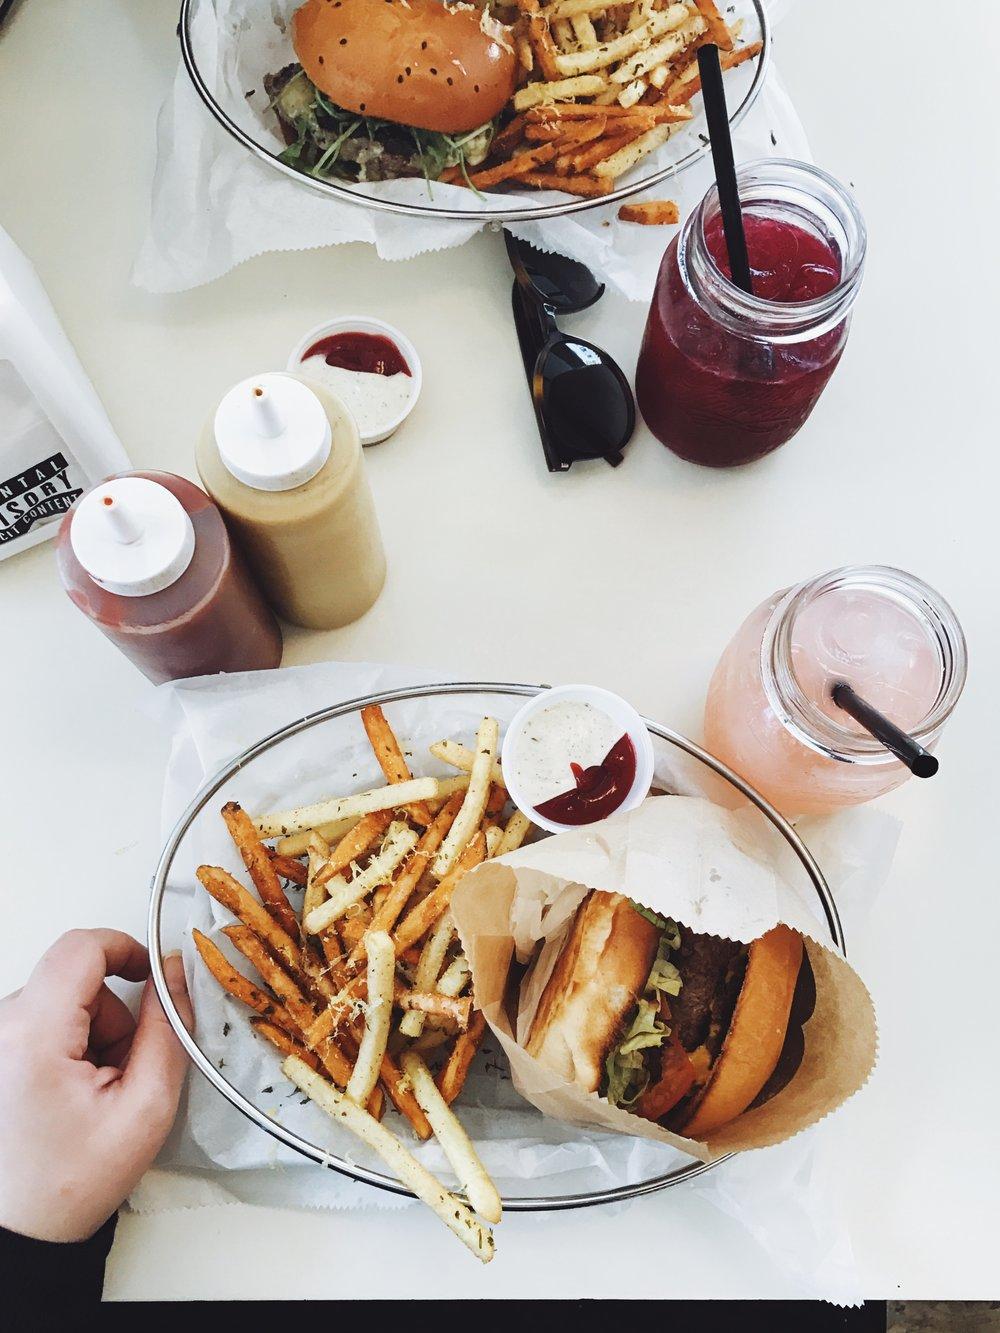 Tel Aviv- Burger in Tel Aviv